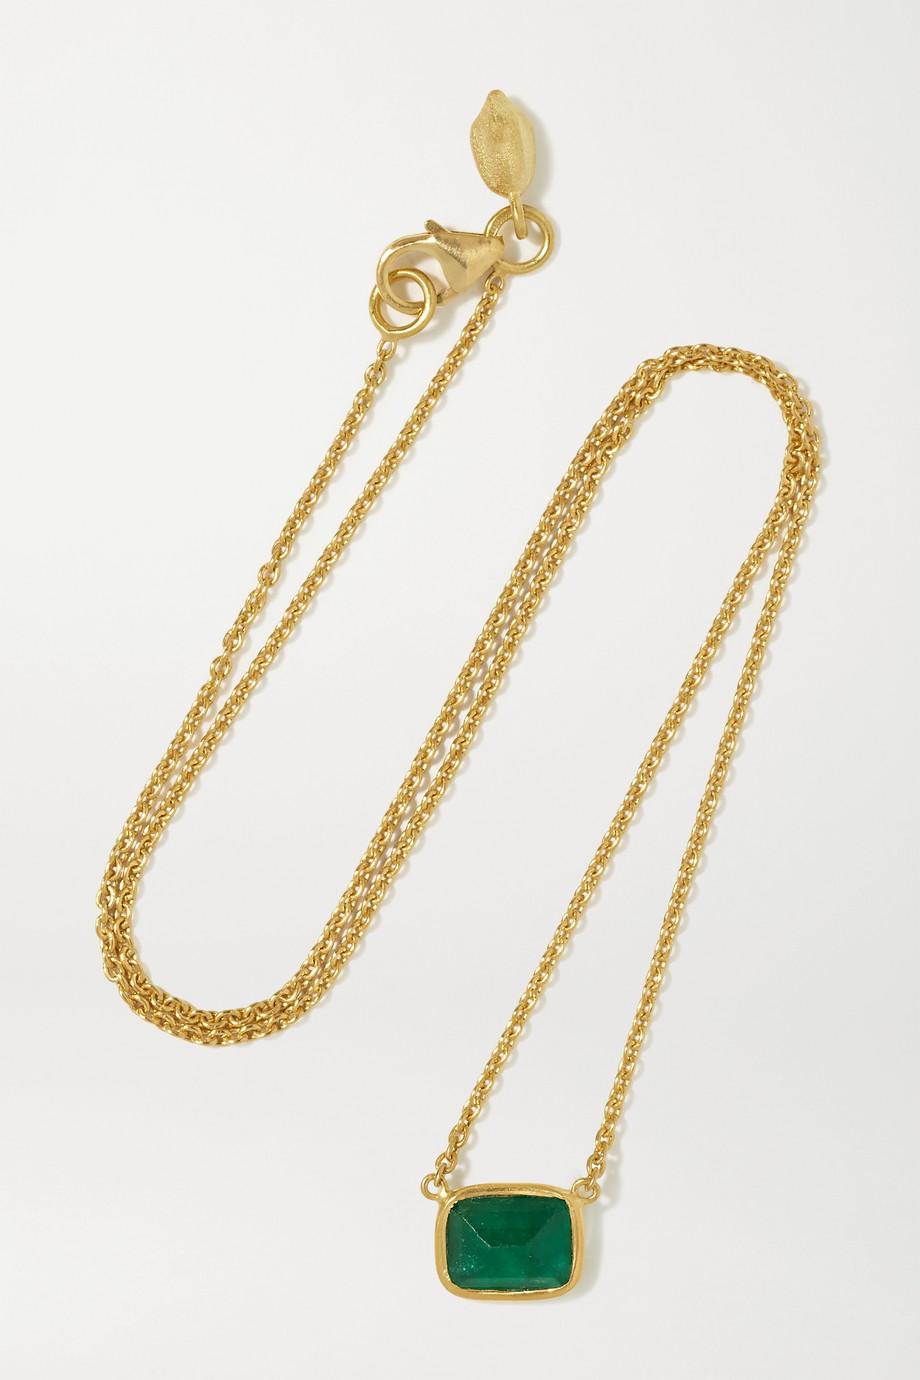 Pippa Small 18-karat gold emerald necklace